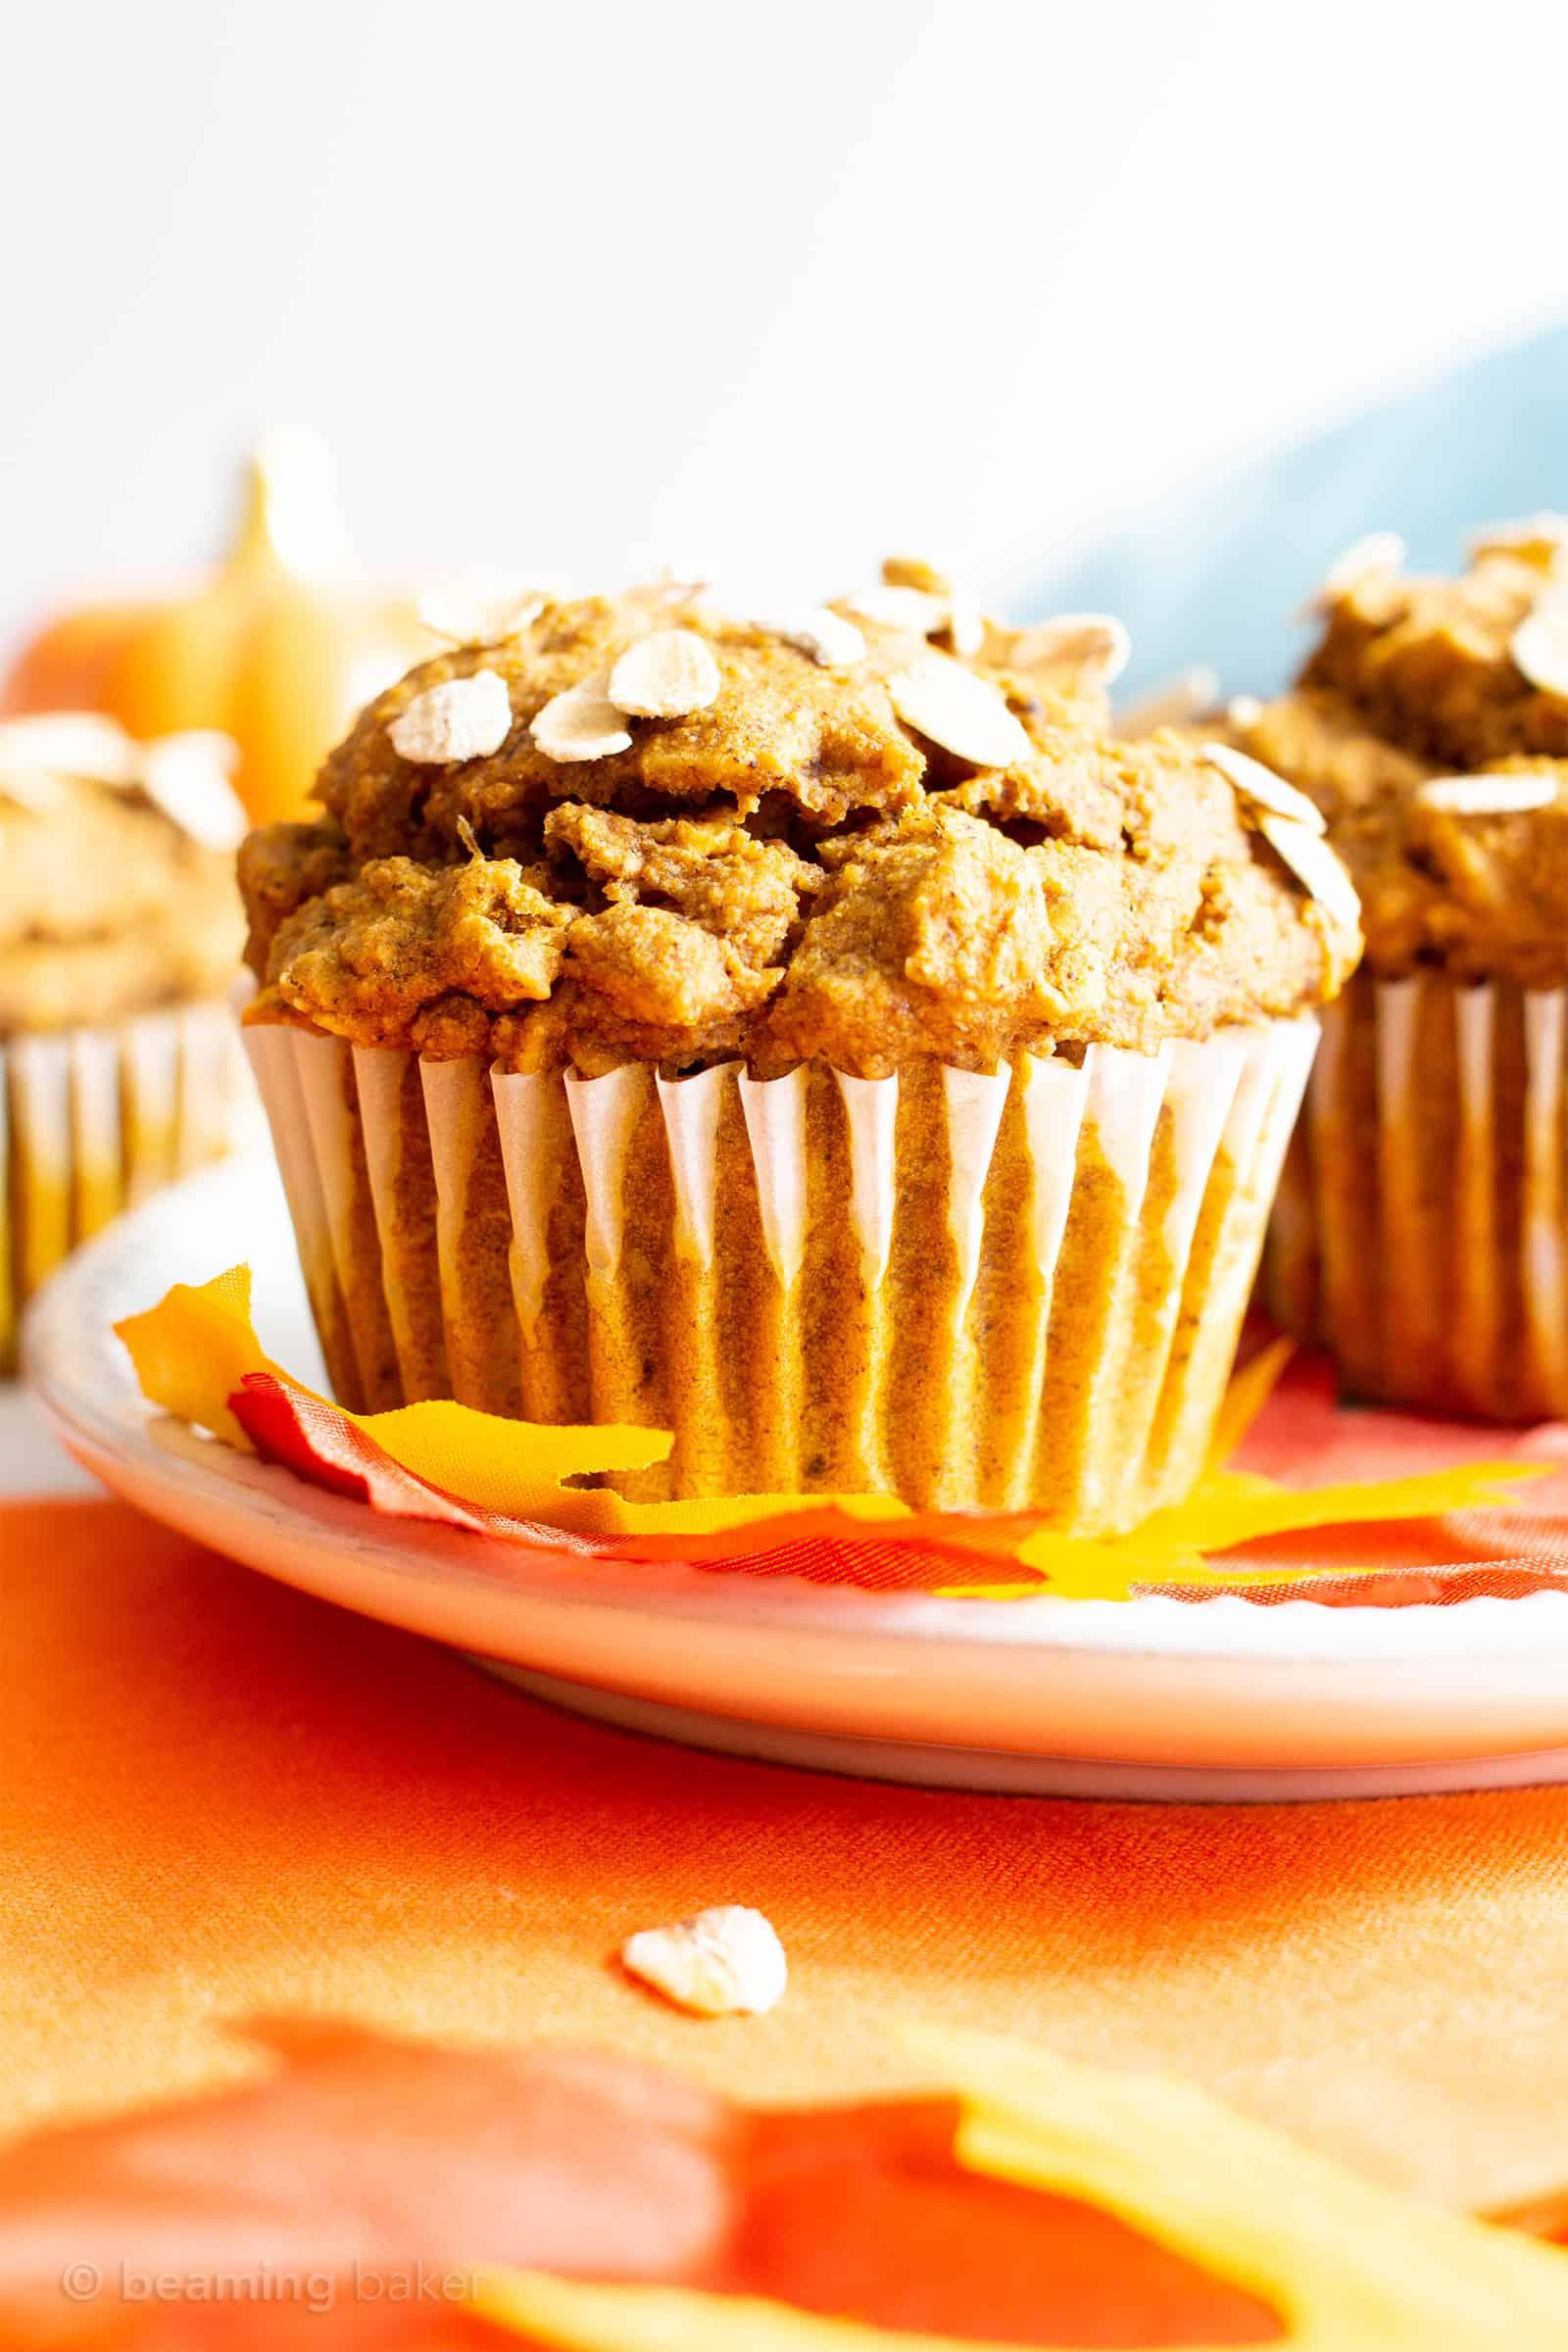 This Healthy Pumpkin Oatmeal Muffins recipe yields lightly sweet, moist pumpkin oatmeal muffins made with vegan + gluten free ingredients. #Pumpkin #Oatmeal #Muffins | Recipe at BeamingBaker.com